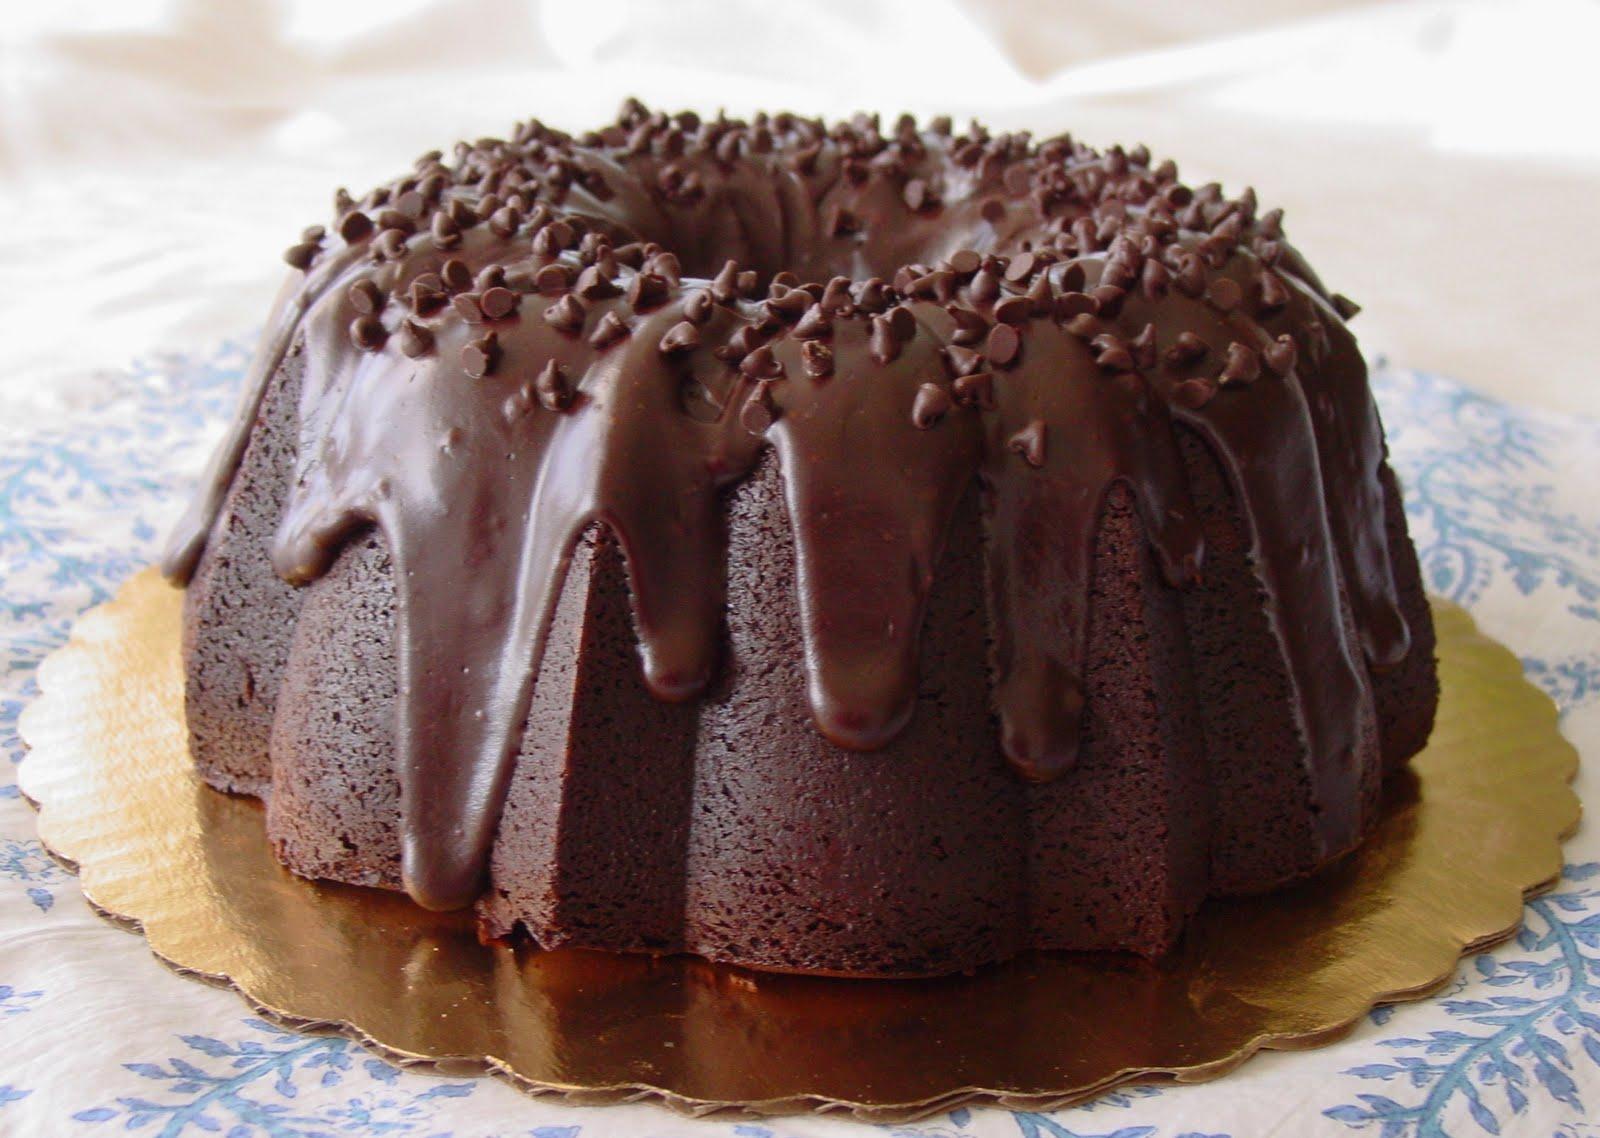 Nordicware 60th Anniversary 12 Cup Bundt Cake Pan